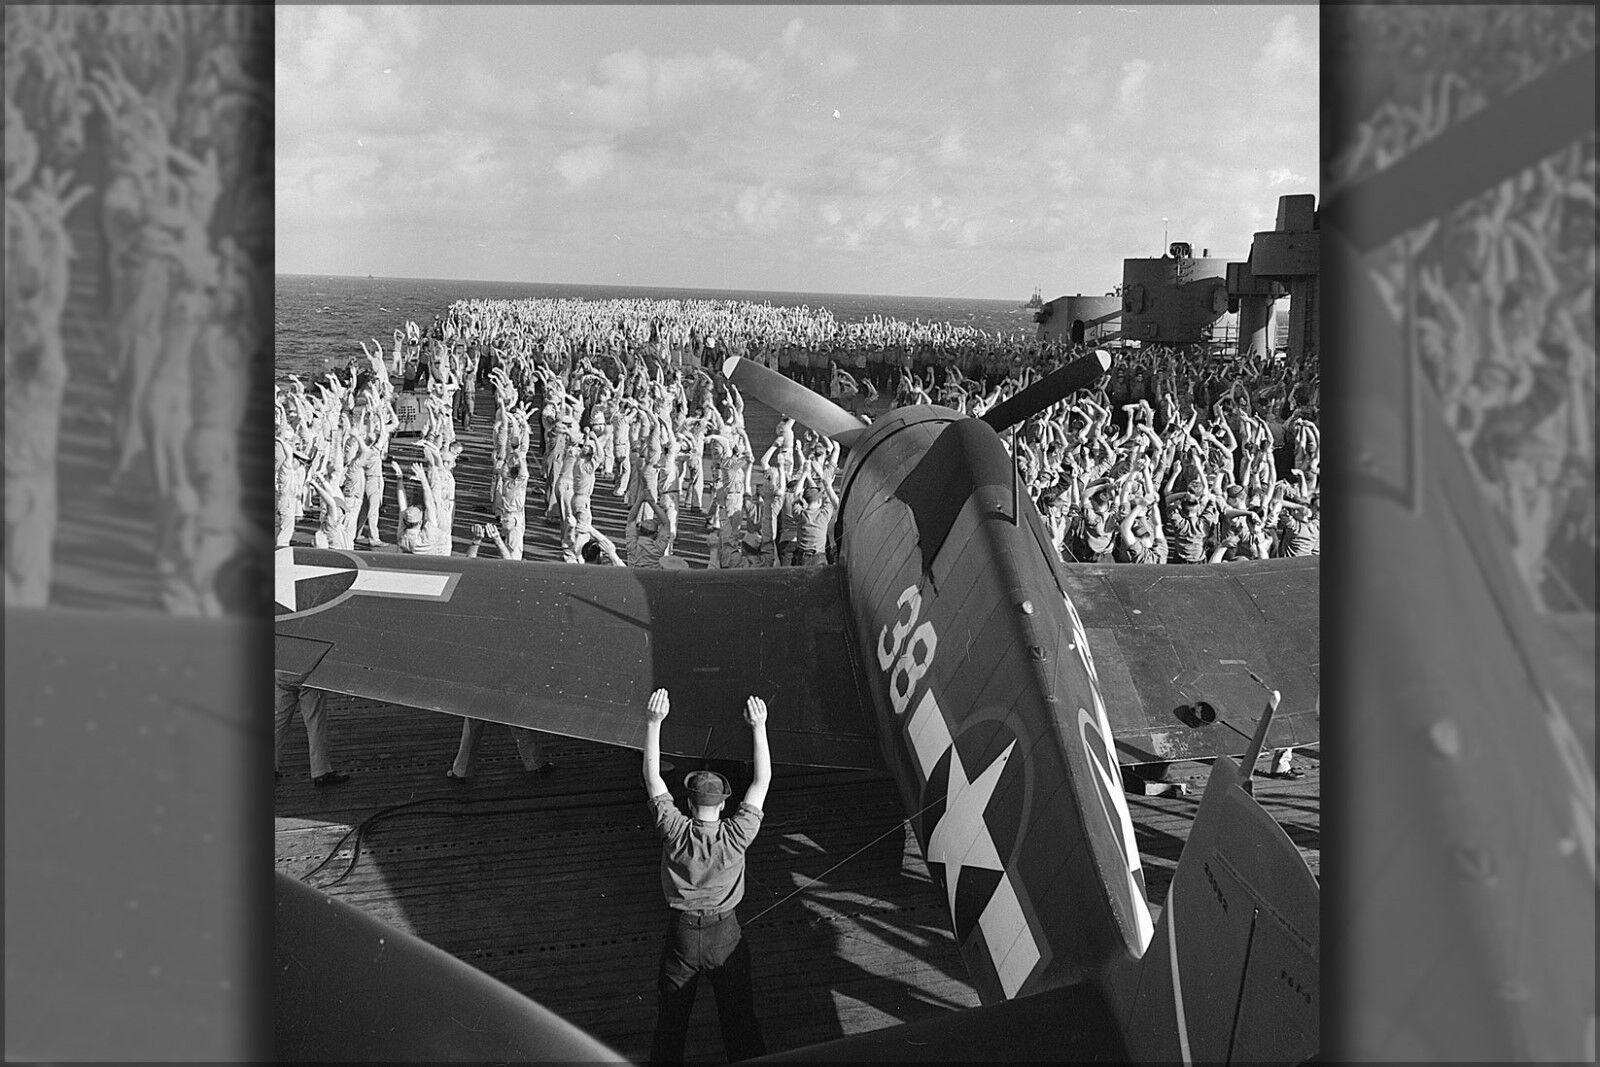 Poster, Molte Misure; Misure; Misure; Crew D' Uss Yorktown (Cv-10), Performs Mattina c3169e